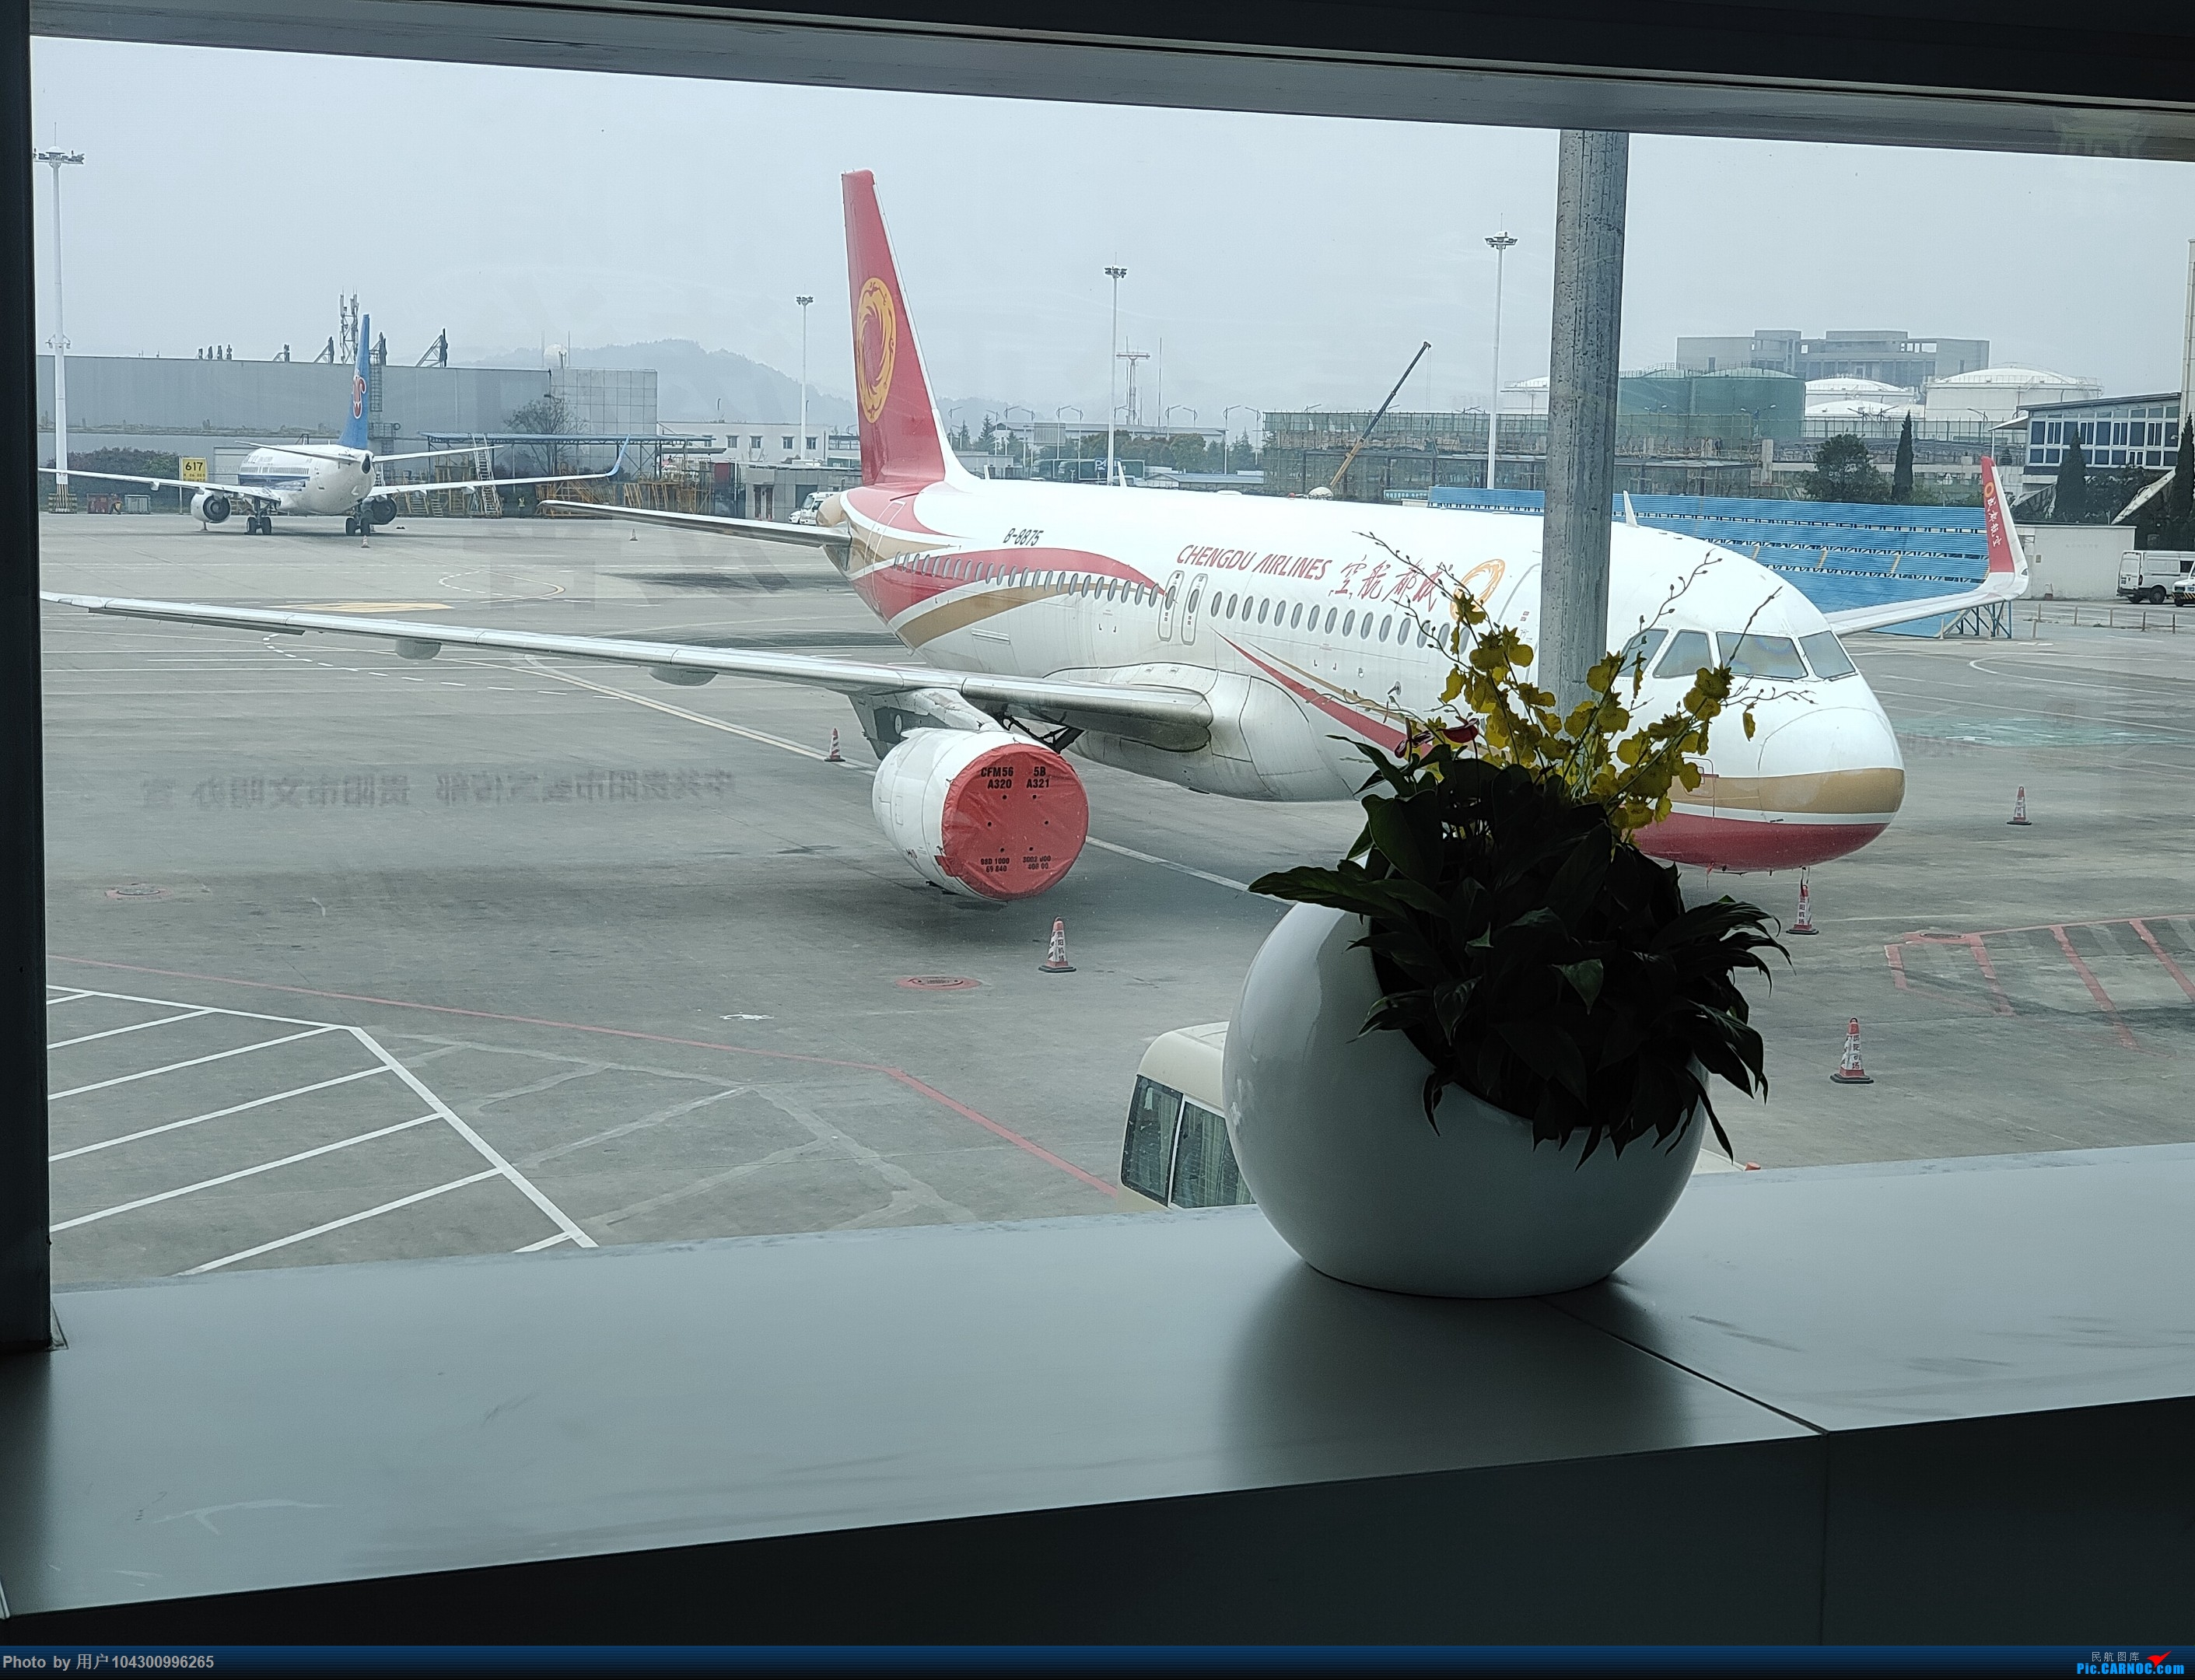 Re:DM游记之GY贵阳-成都往返(参观空港花田) AIRBUS A320-200 B-8875 中国贵阳龙洞堡国际机场